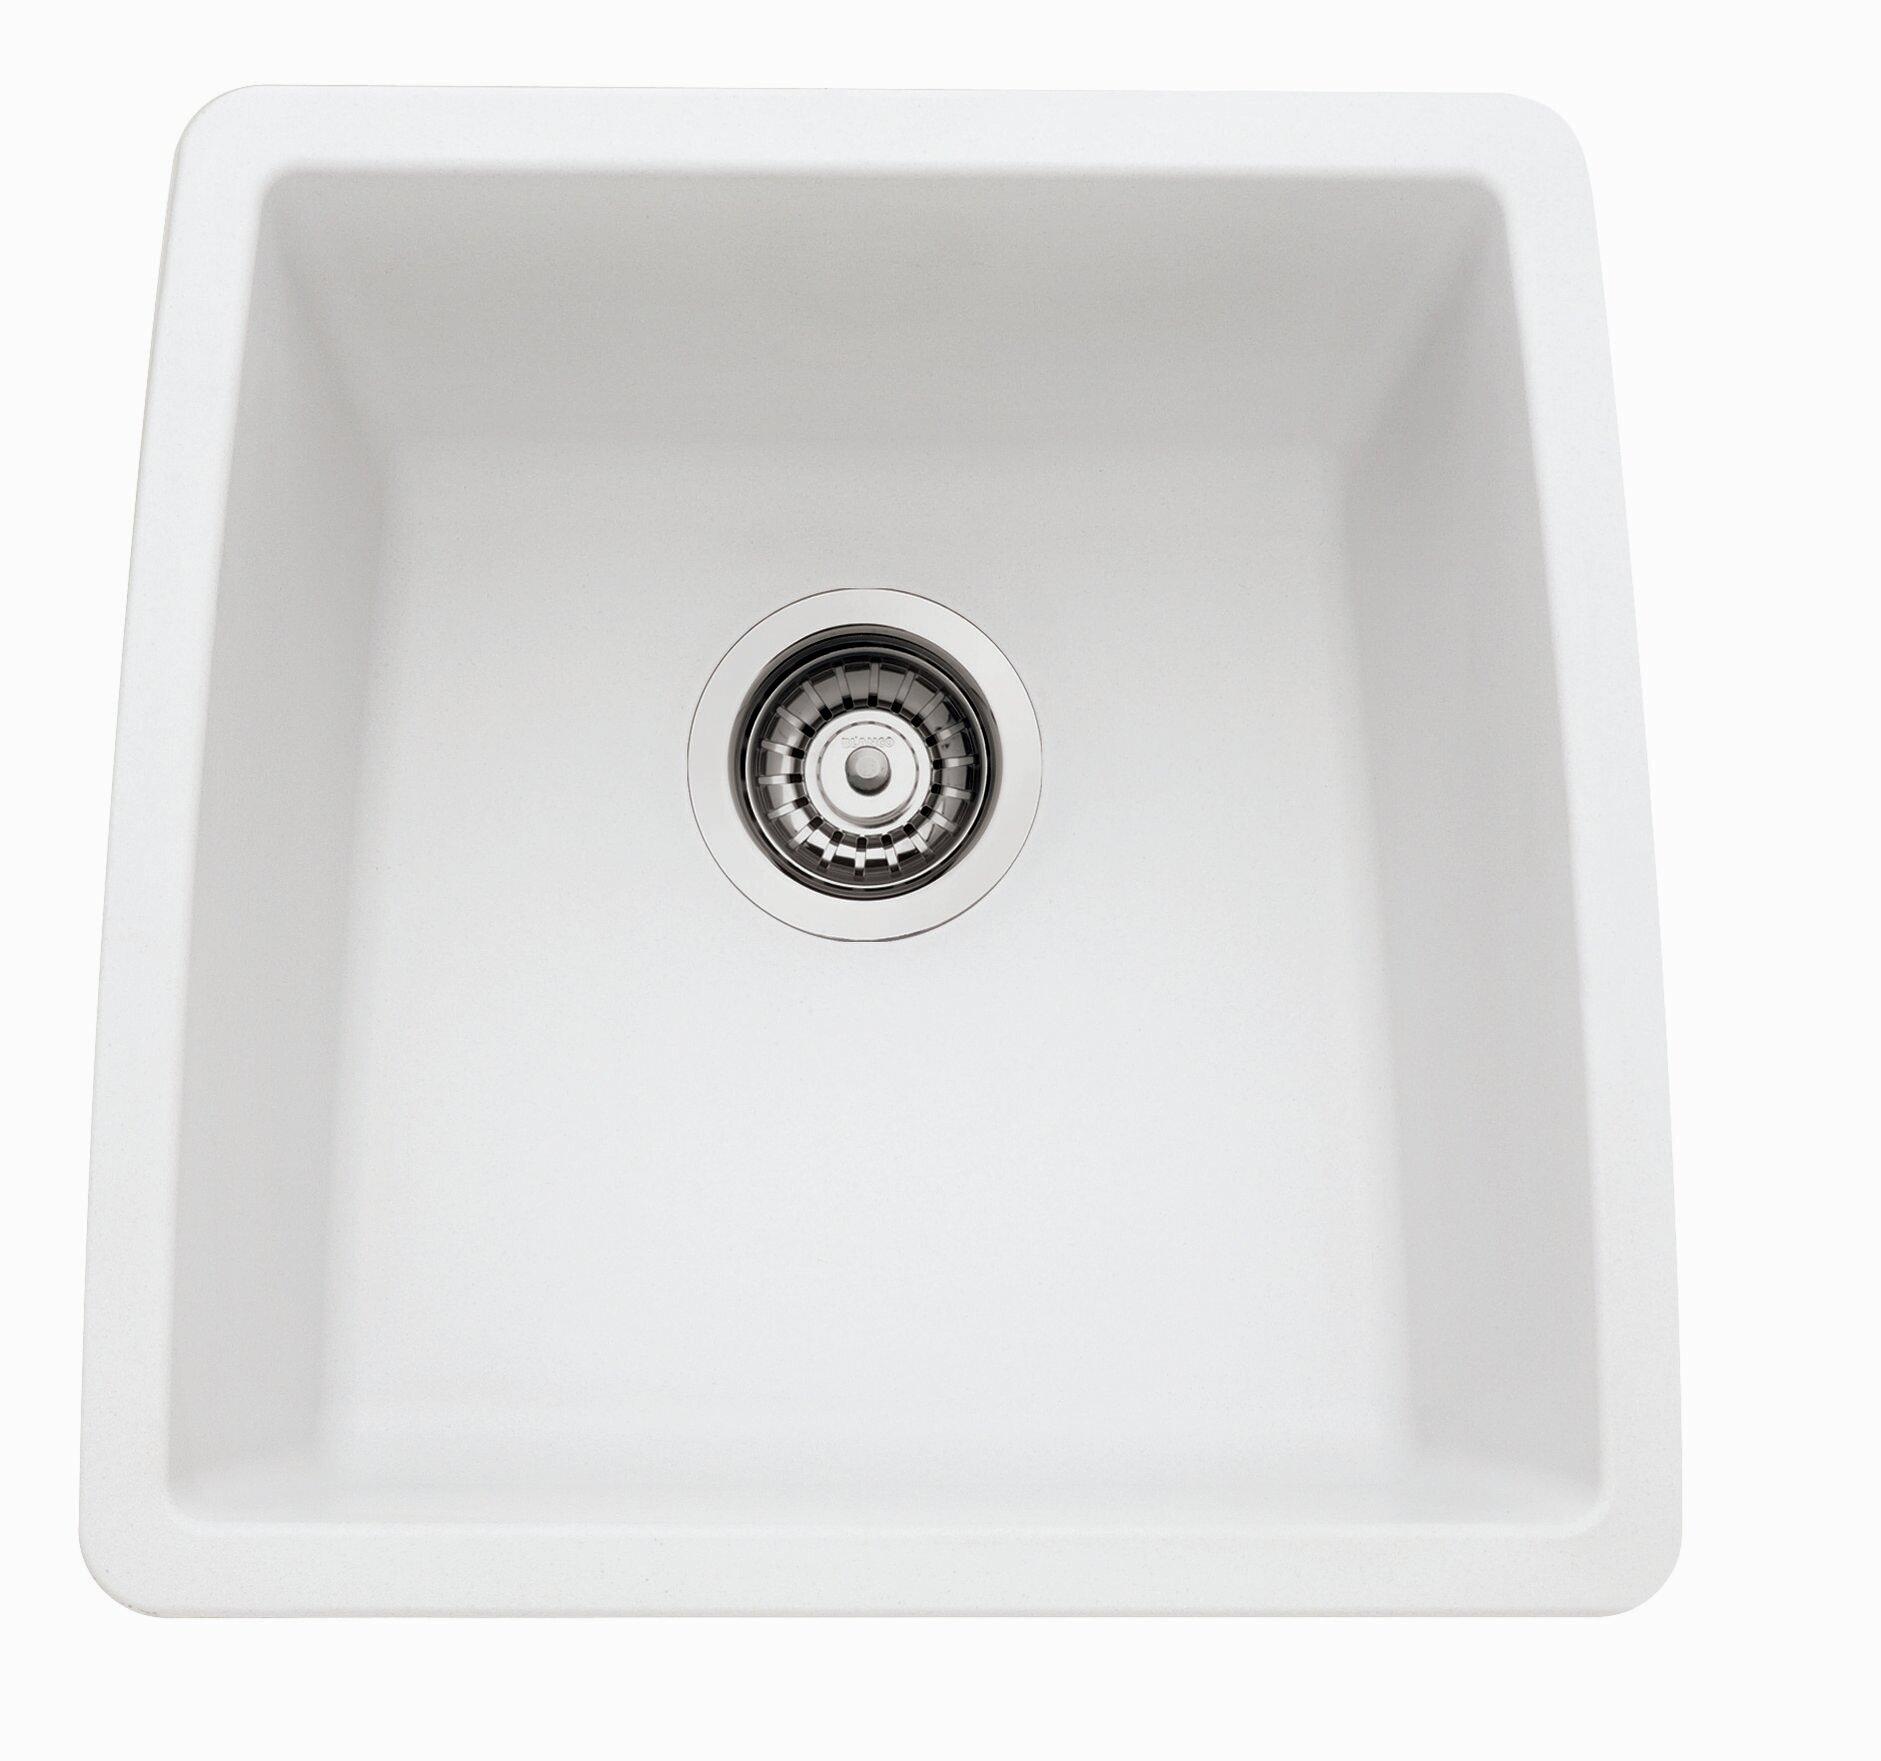 Blanco Performa 17 5 L X W Silgranit Ii Single Bowl Undermount Bar Sink Reviews Wayfair